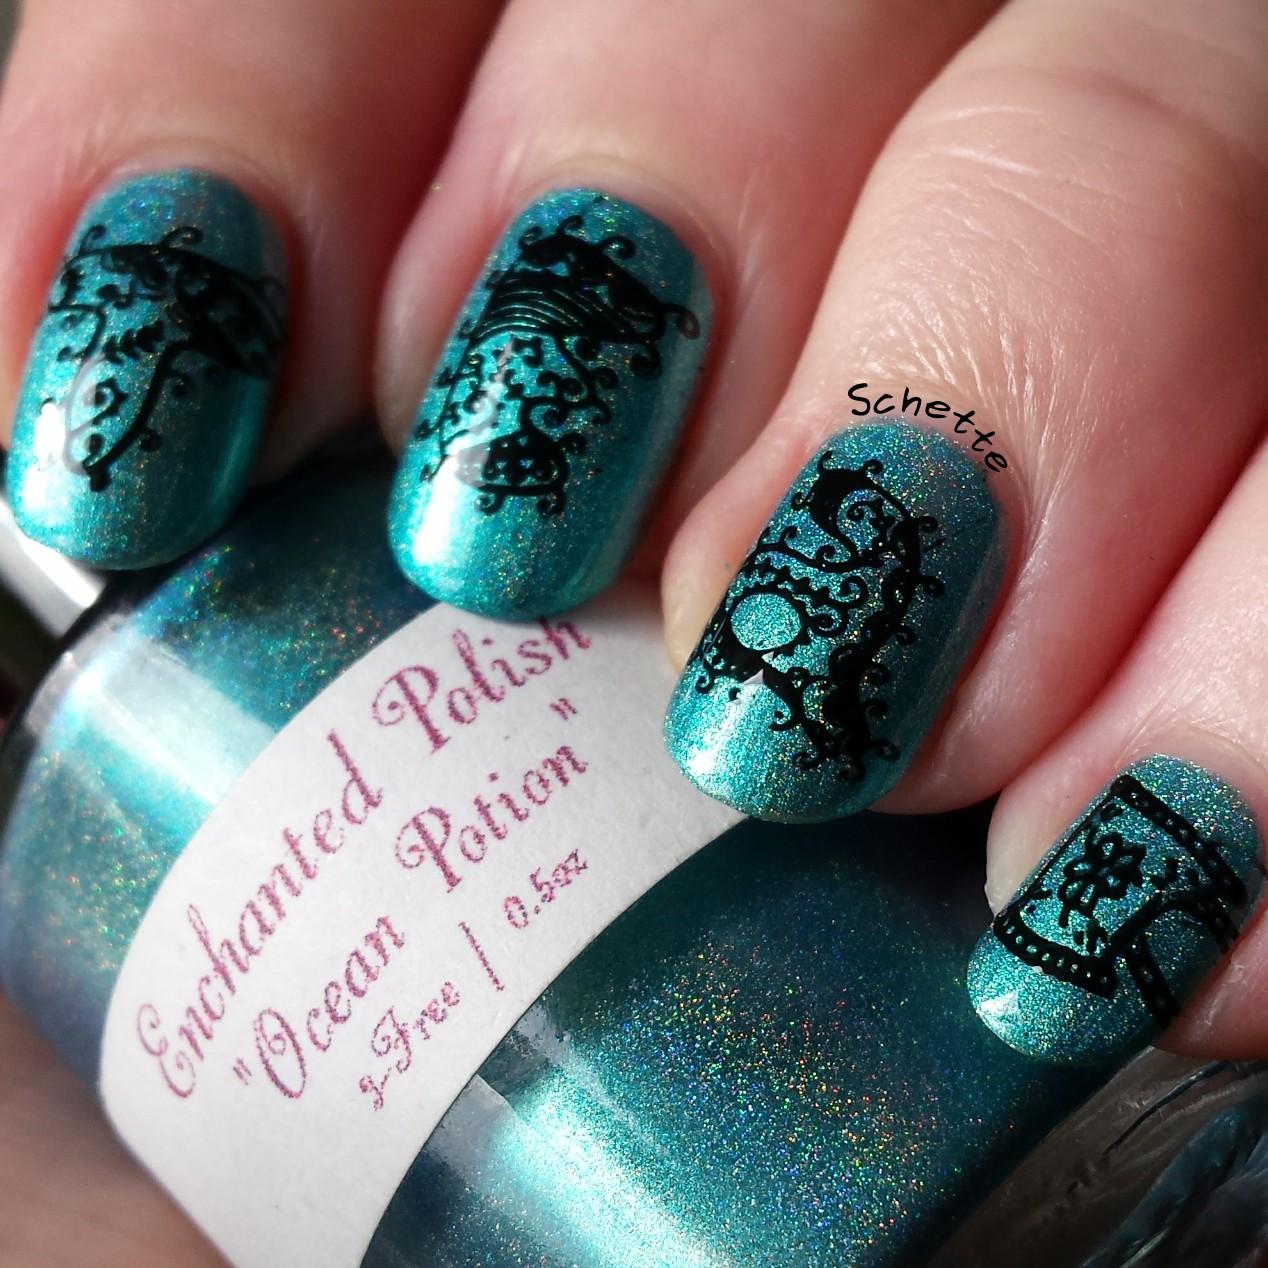 Enchanted Polish - Ocean Potion